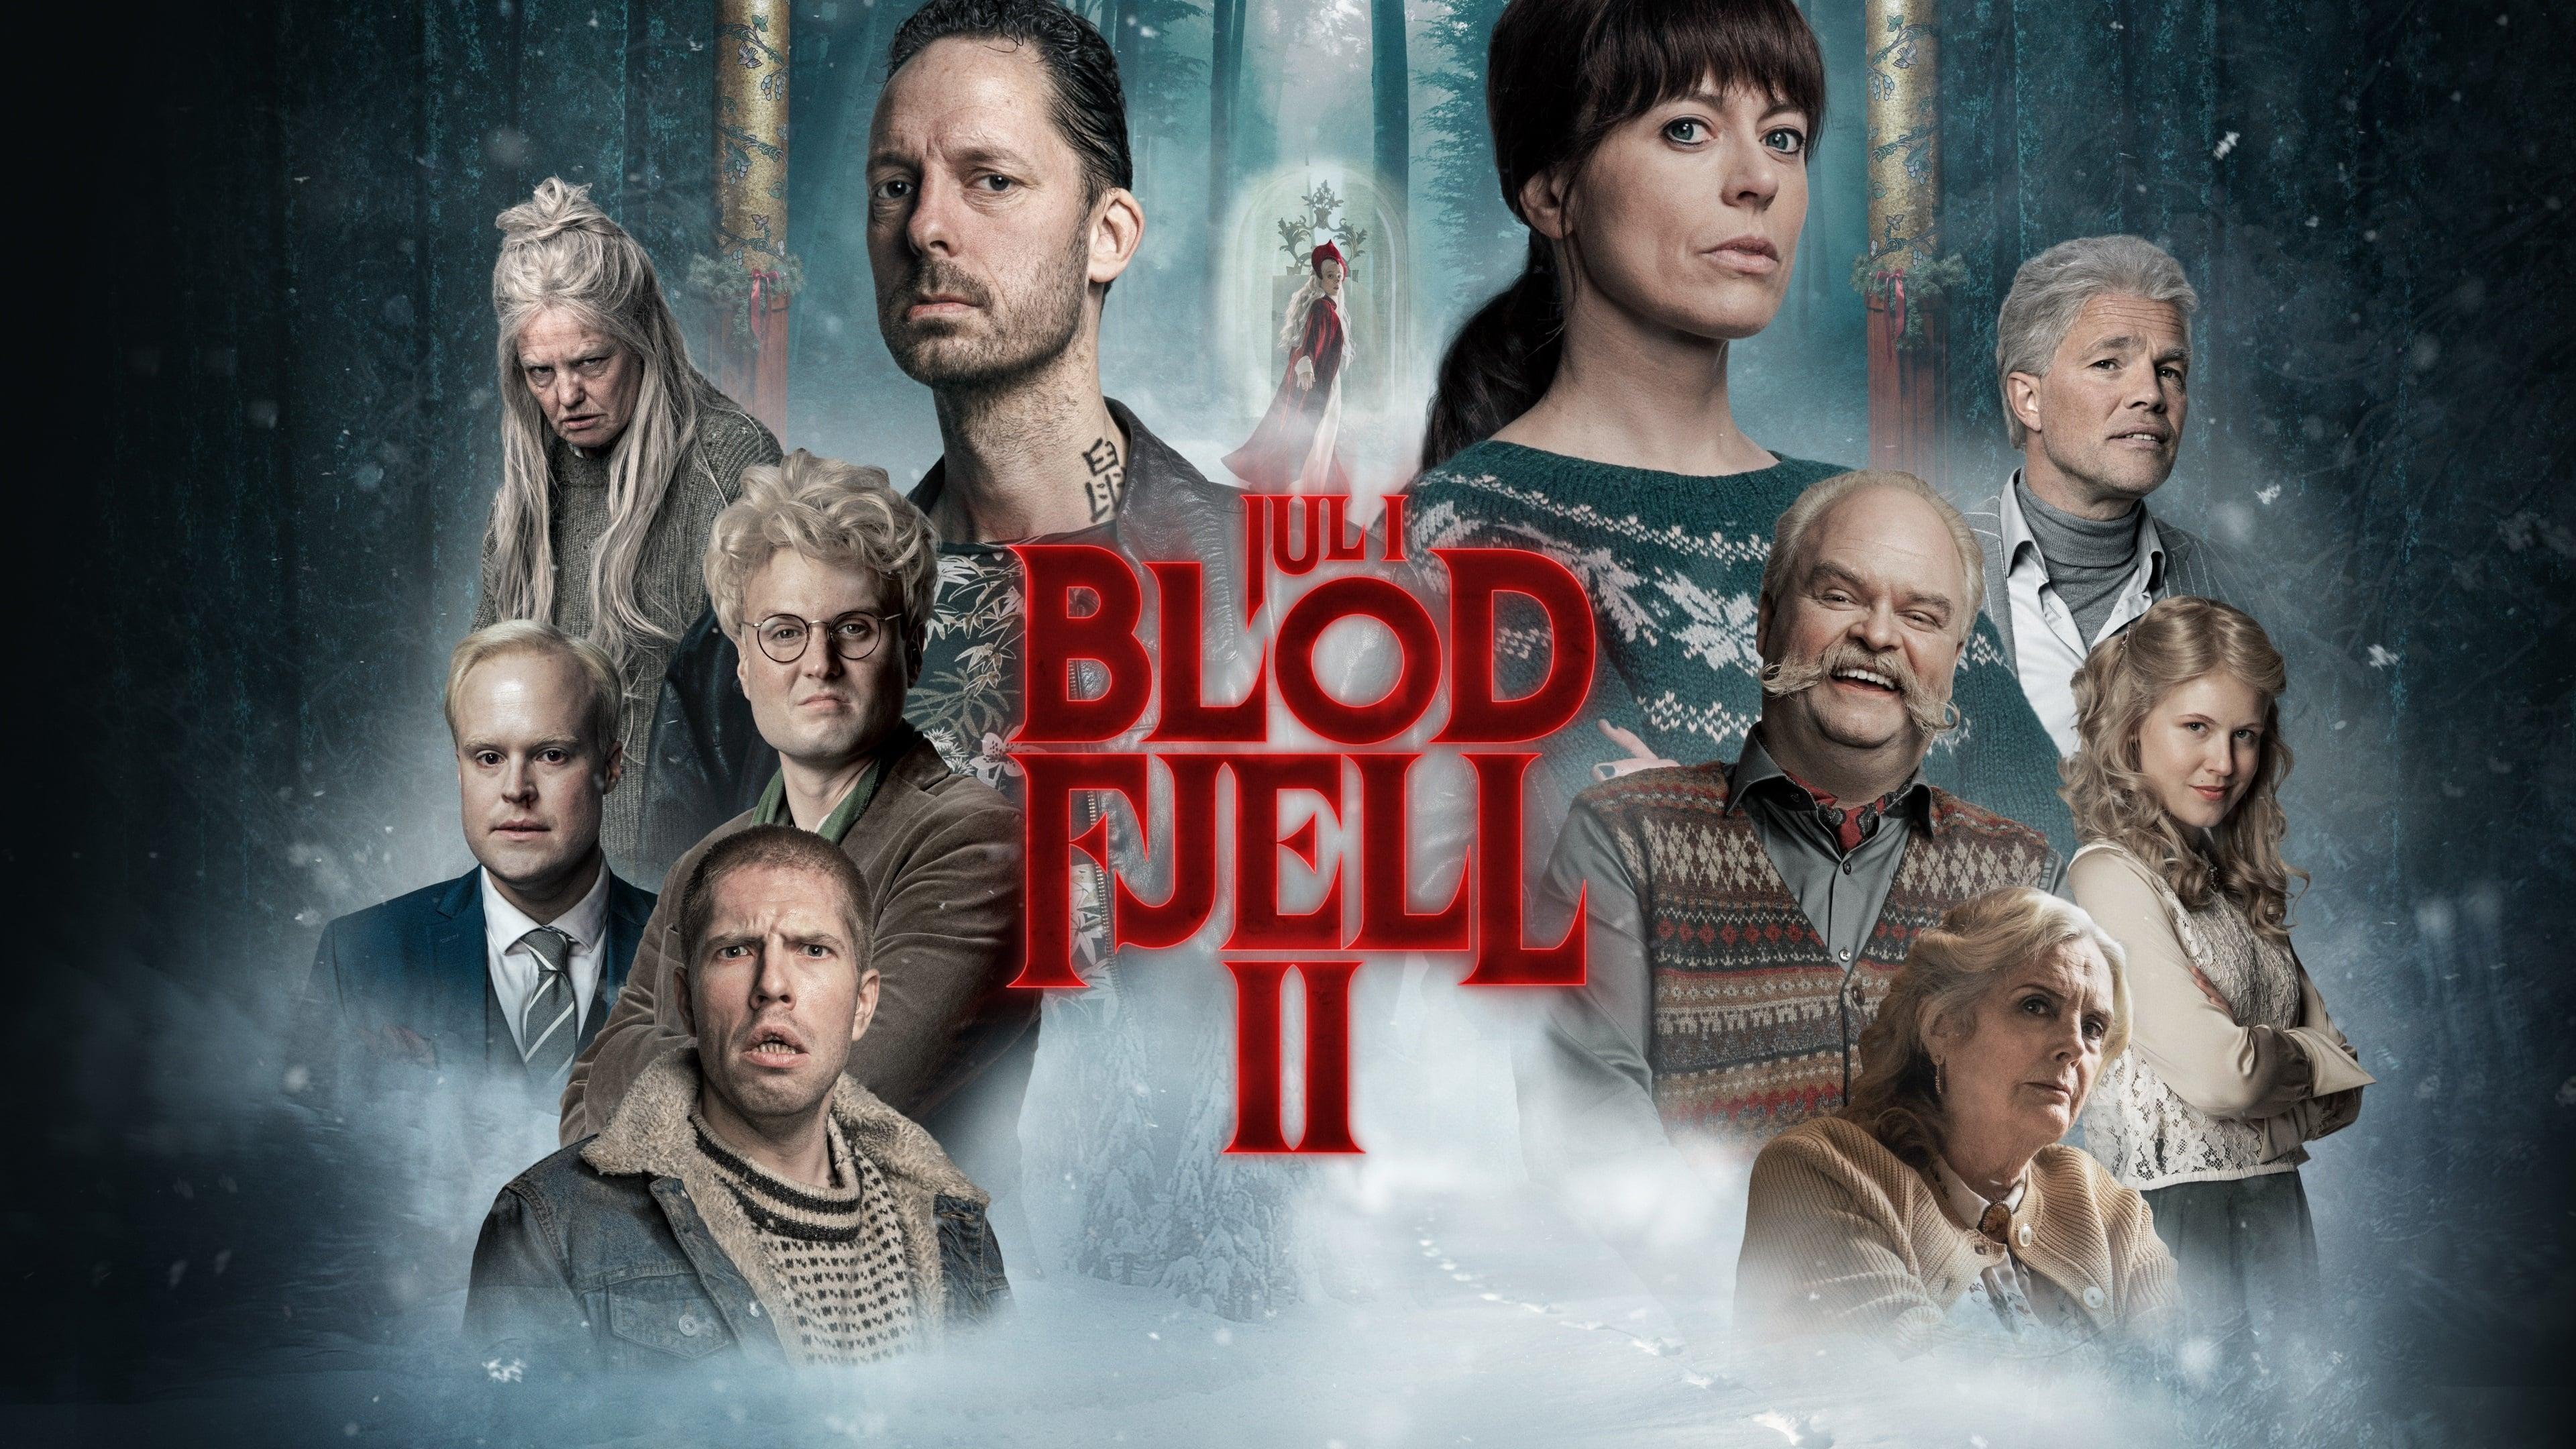 Jul i Blodfjell - Season 2 Trailer